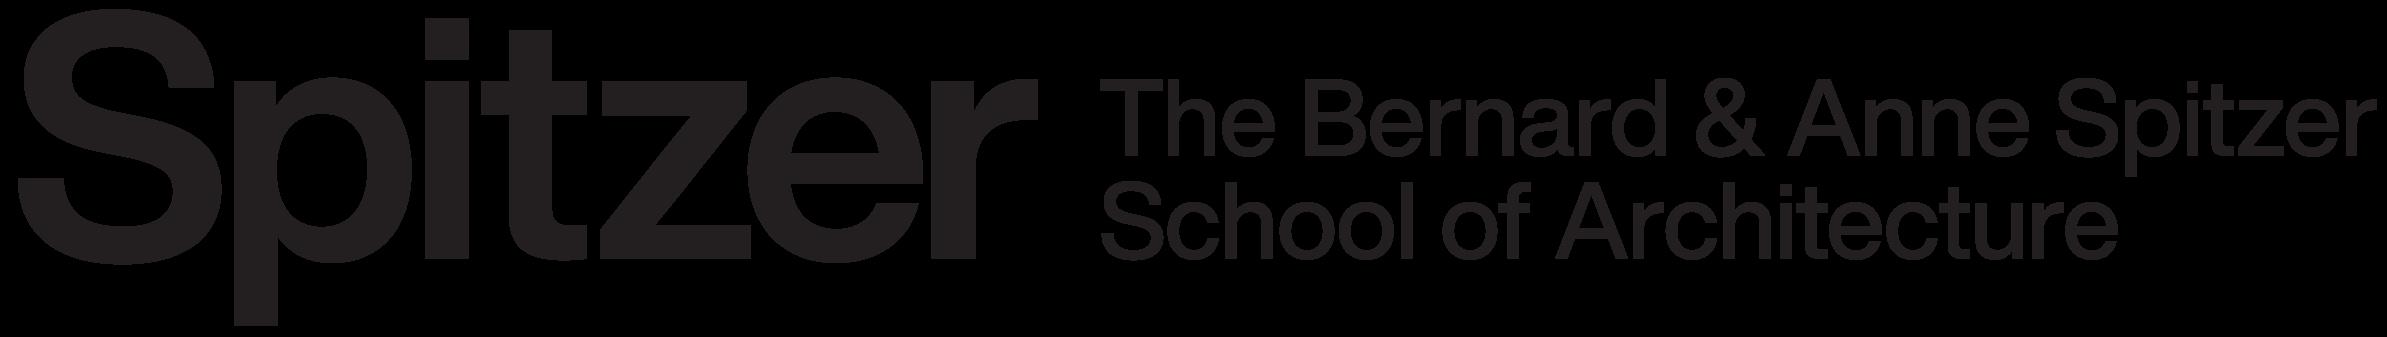 Spitzer School of Architecture Website Link